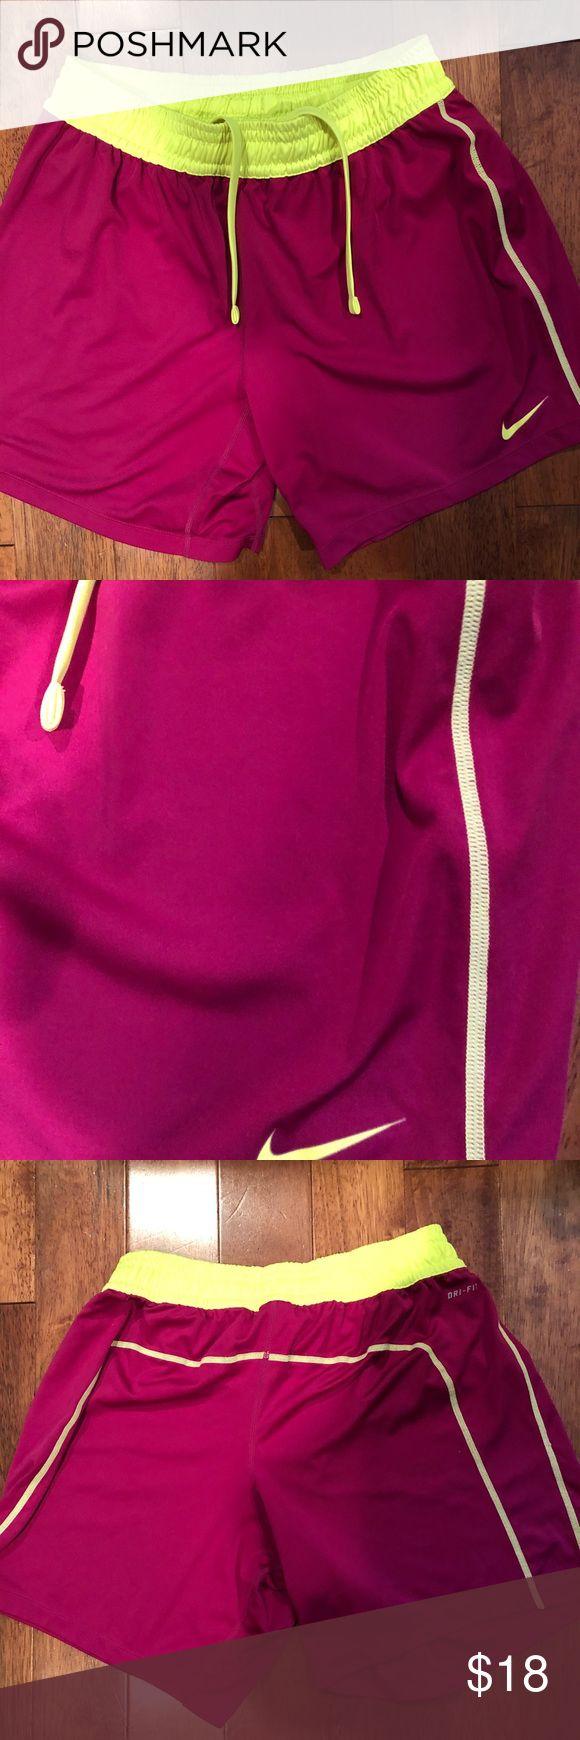 Nike dri fit shorts Bright colored nine dri fit shorts with Nike logo in corner Nike Shorts